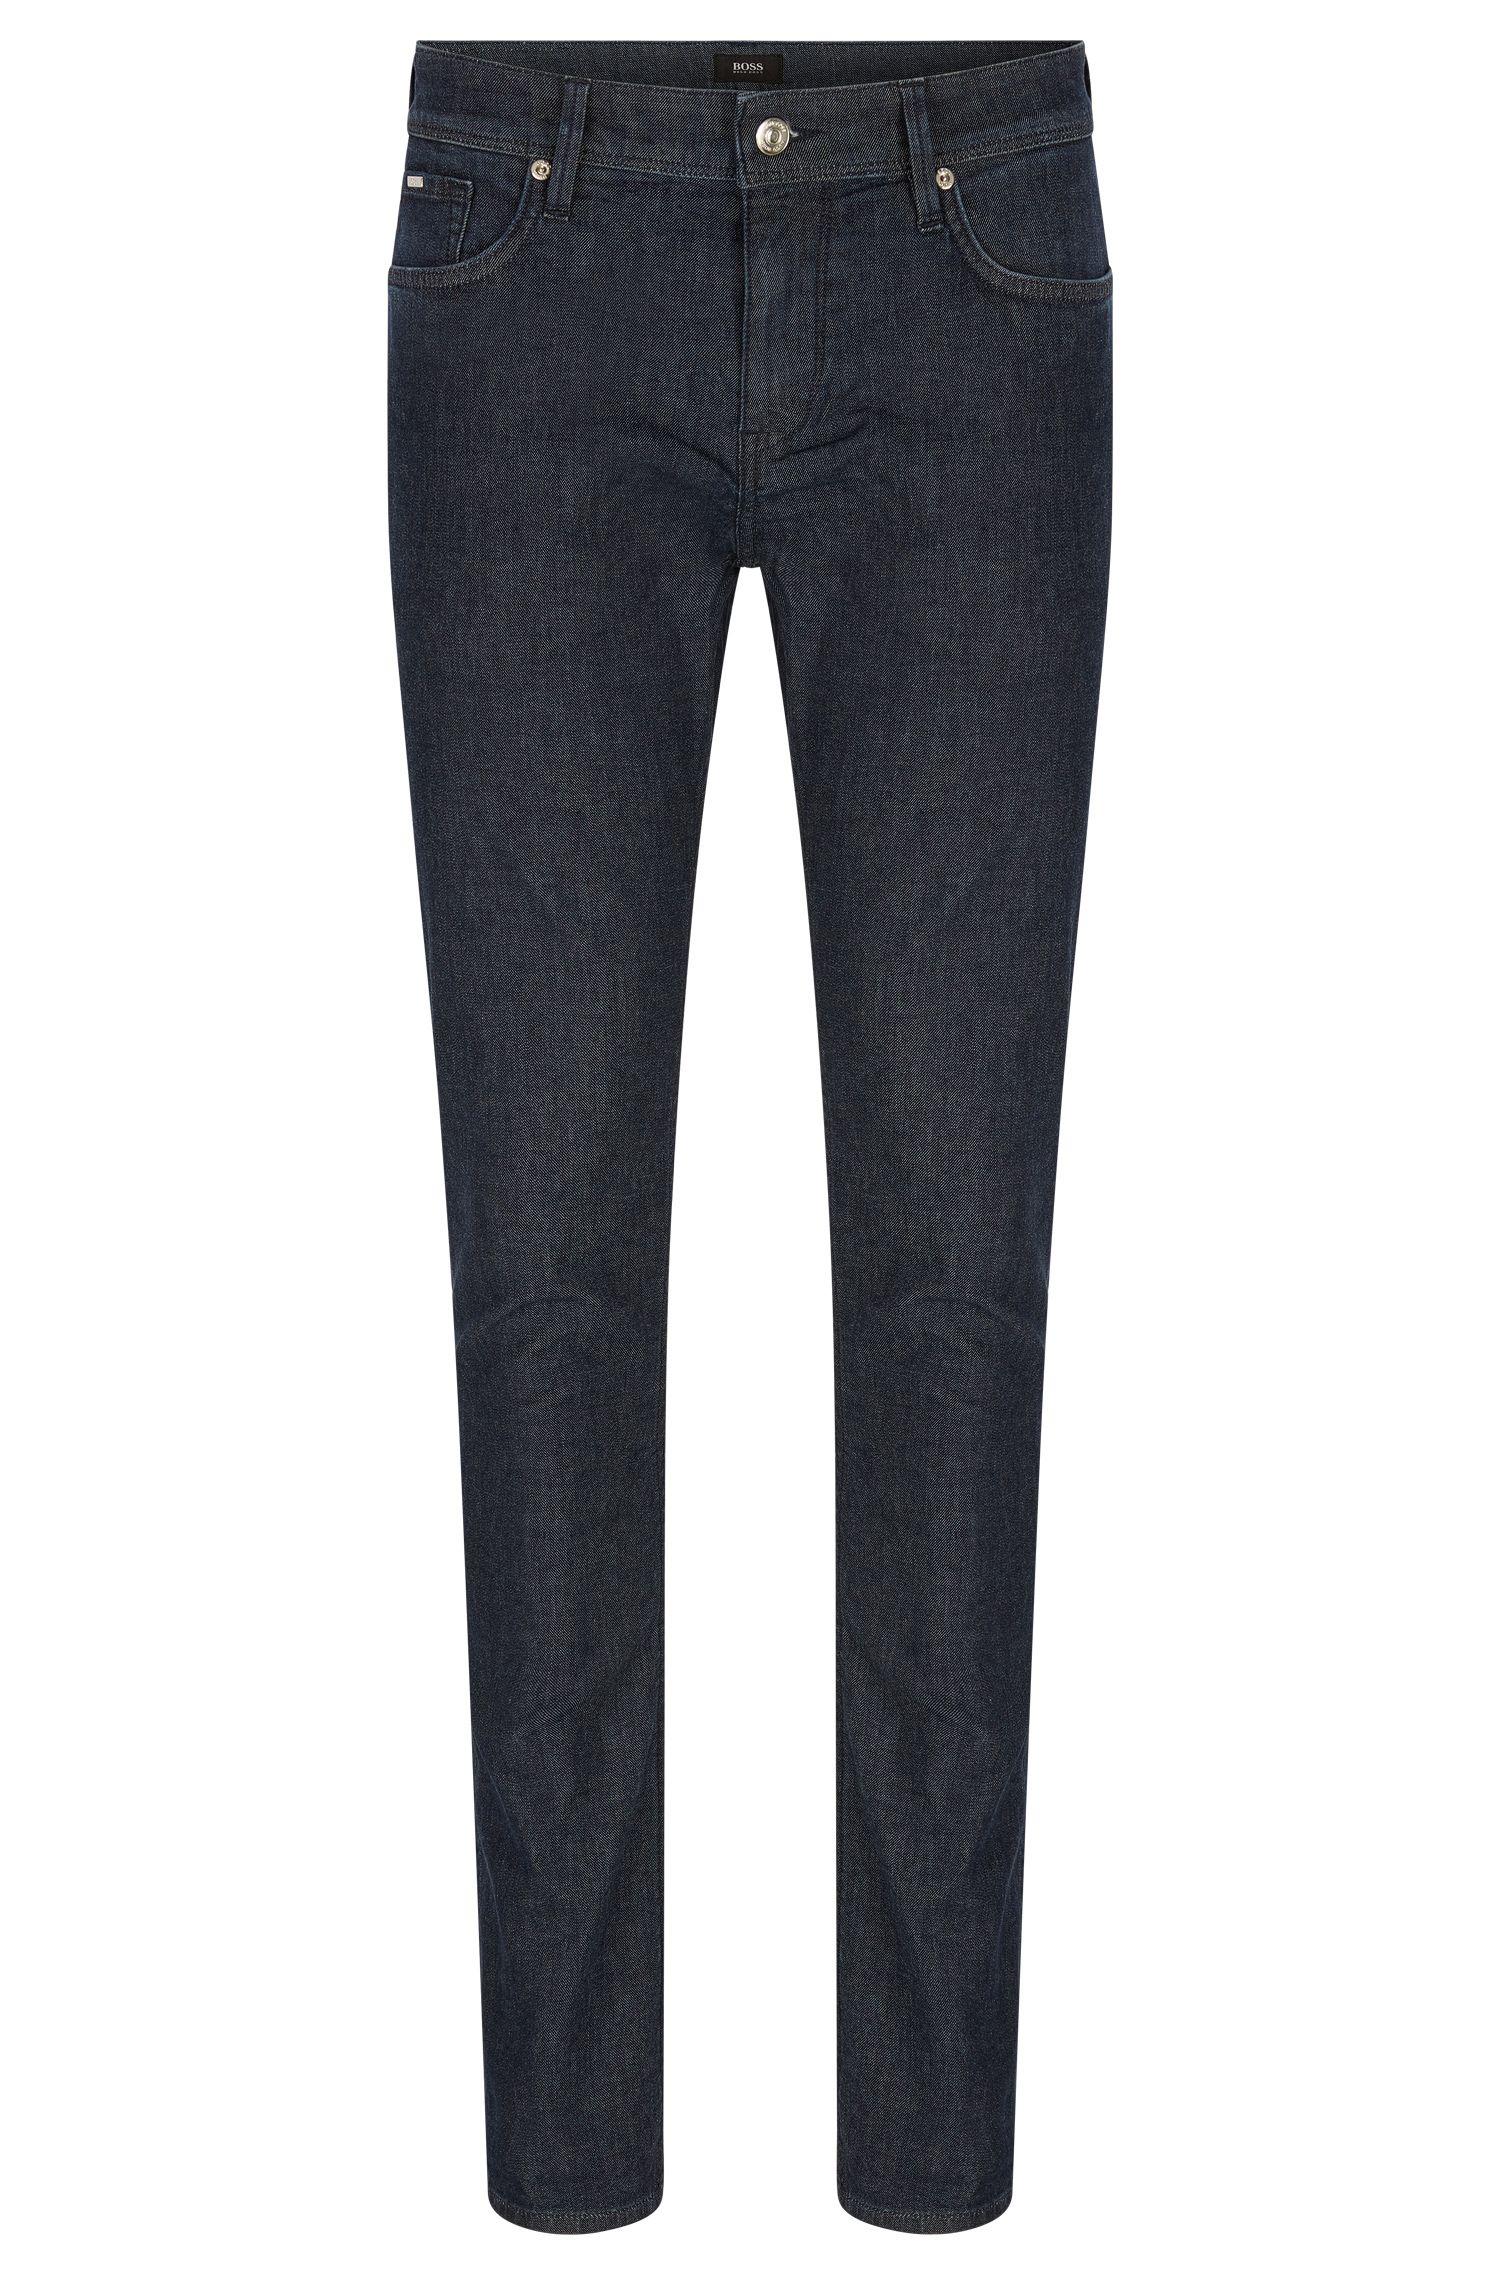 Jeans Slim Fit en tissu stretch de poids moyen